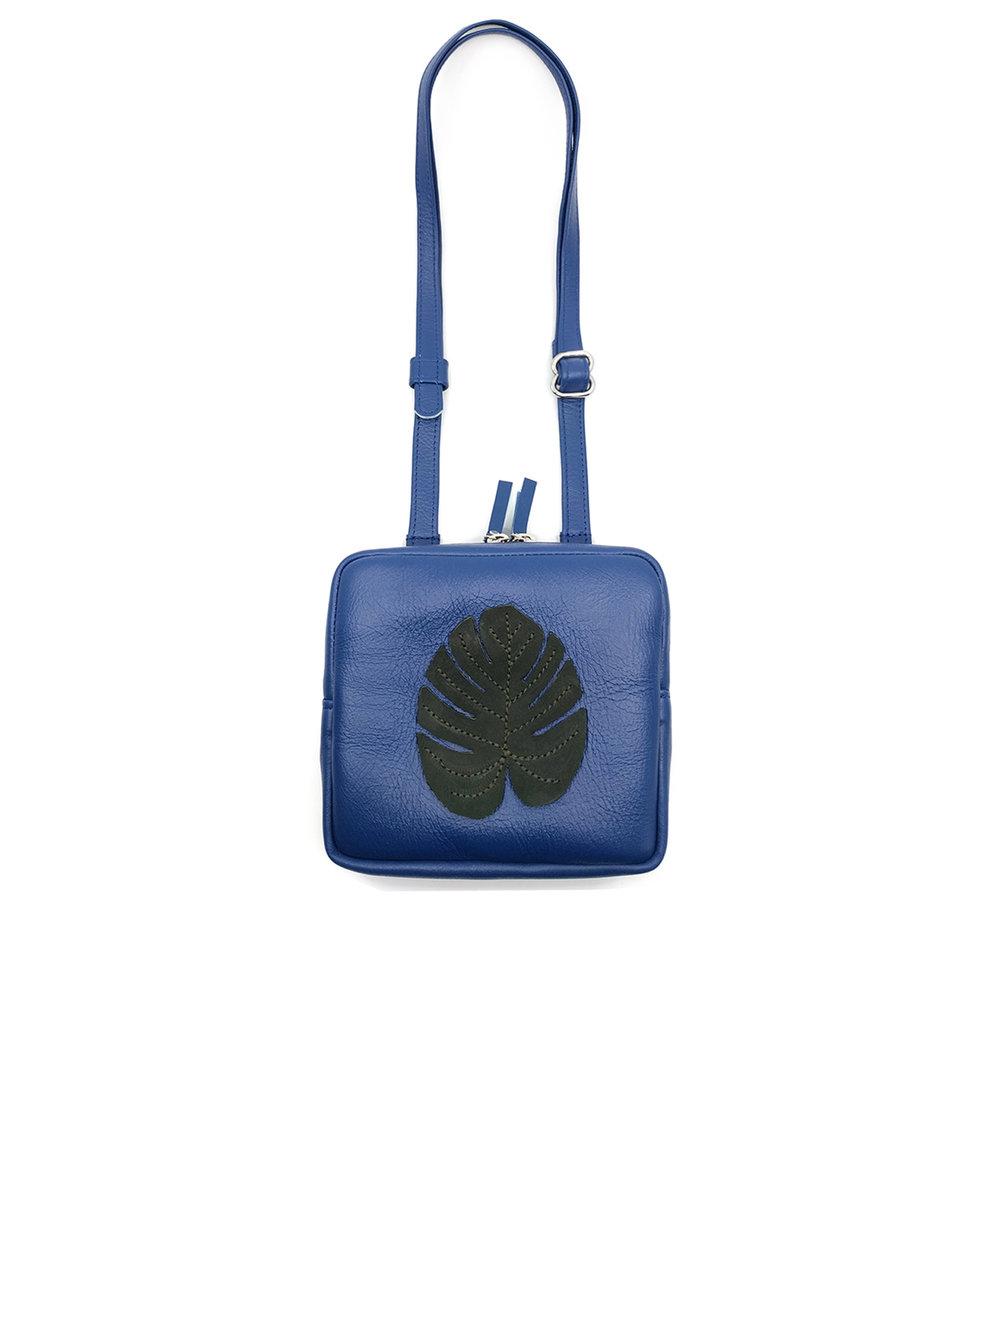 Leaf appliquéMini handbag - more colors available150.00$